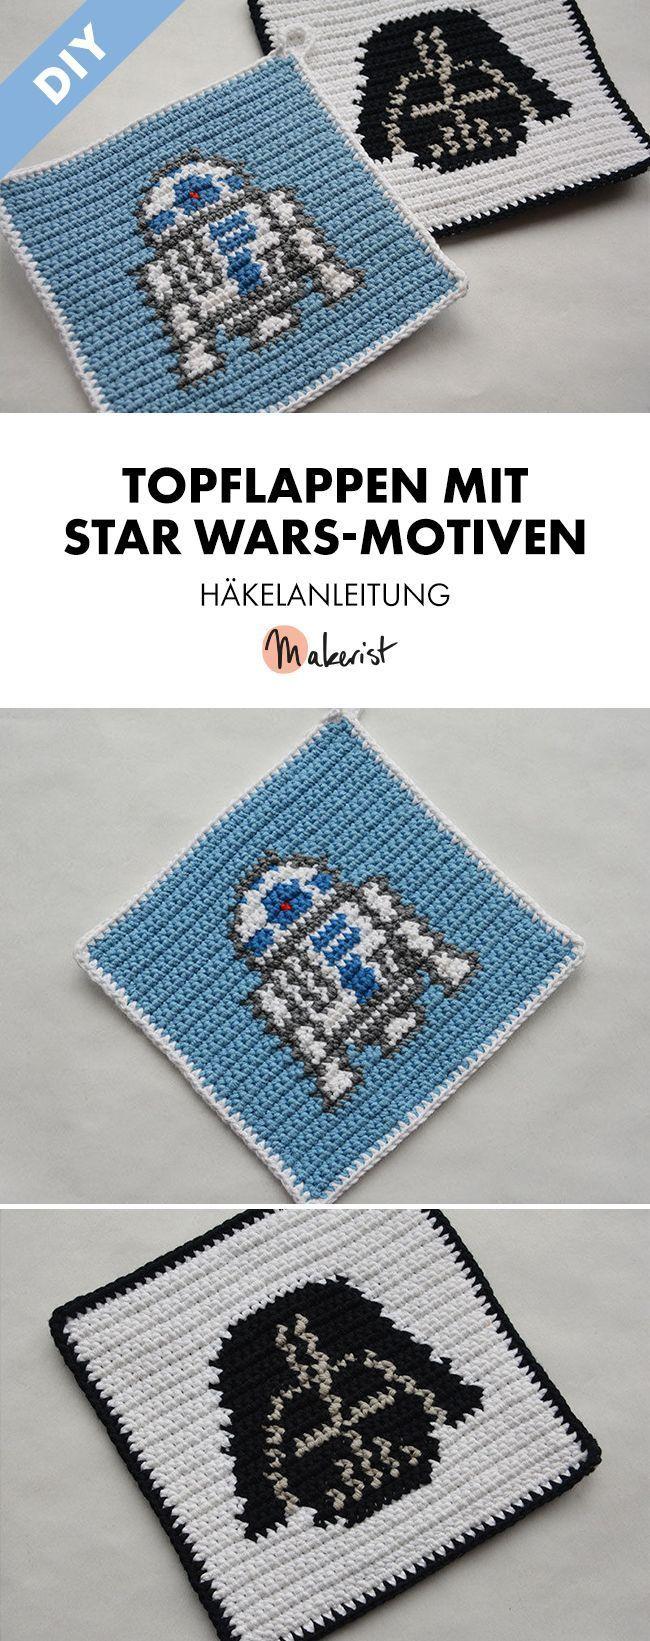 2 Häkelanleitungen-Set Darth Vader und R2D2 Topflappen inkl. Häkel ...